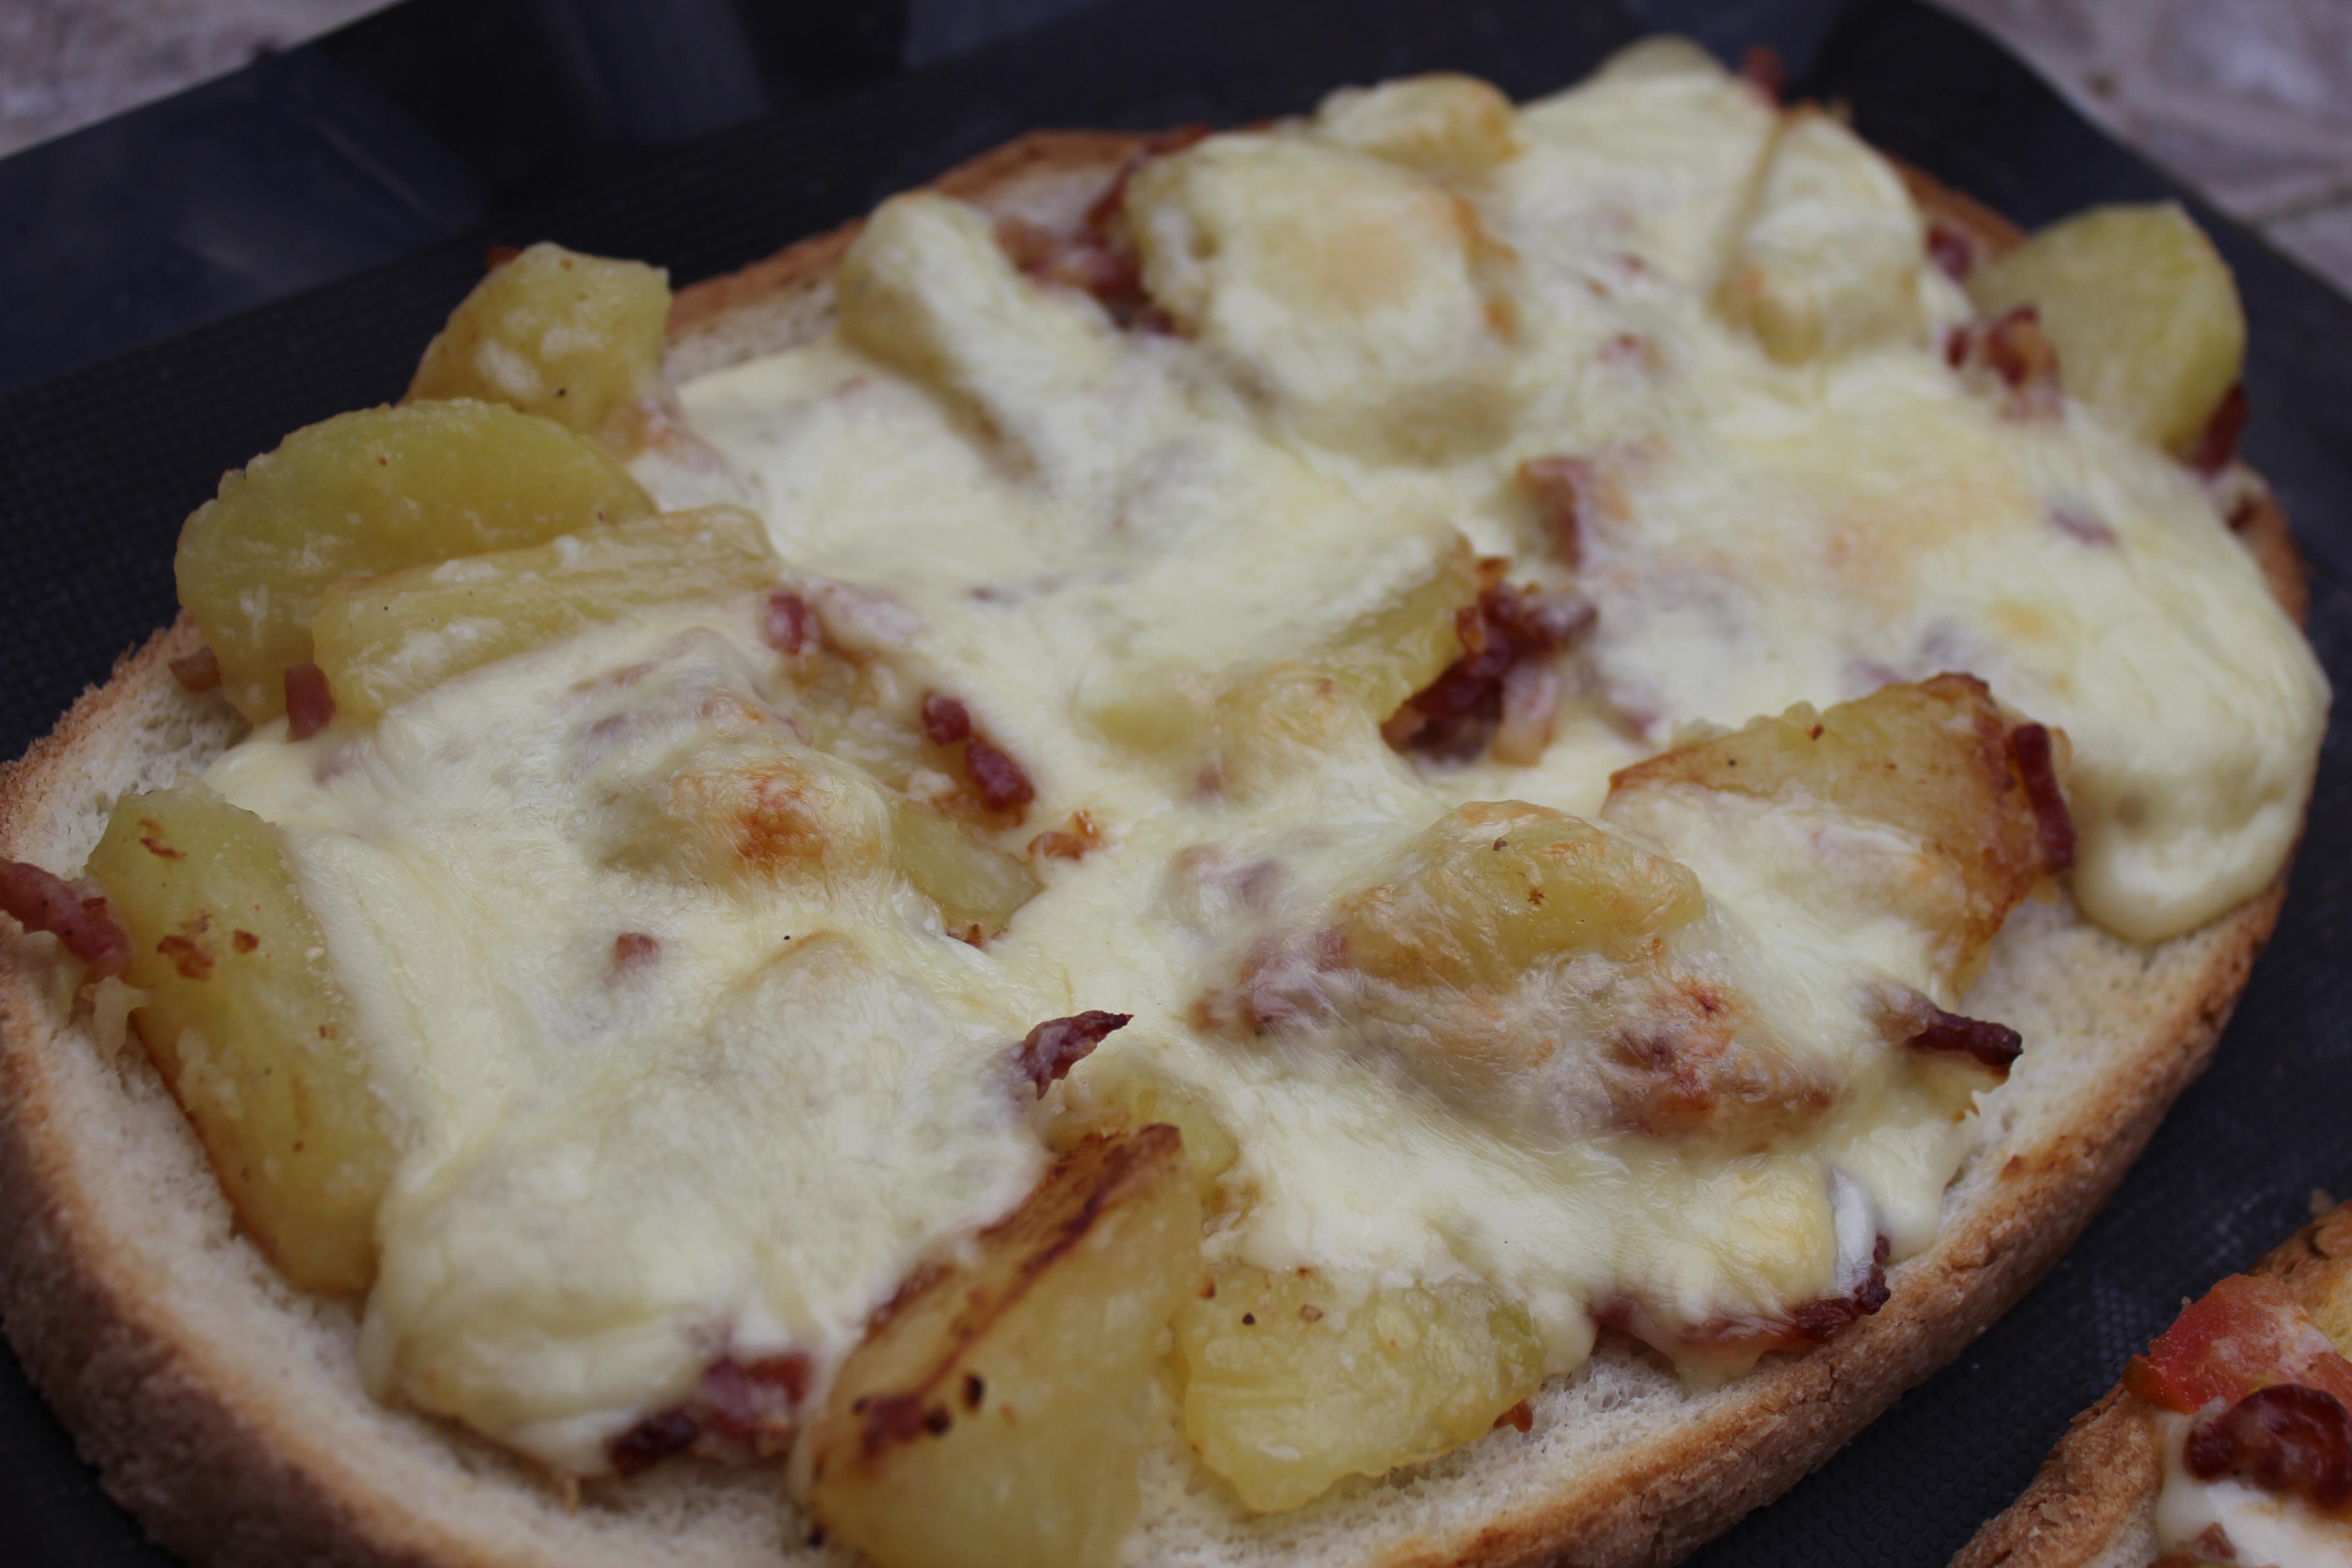 La bruschetta la raclette anne o fourneaux - Coupe fromage a raclette ...